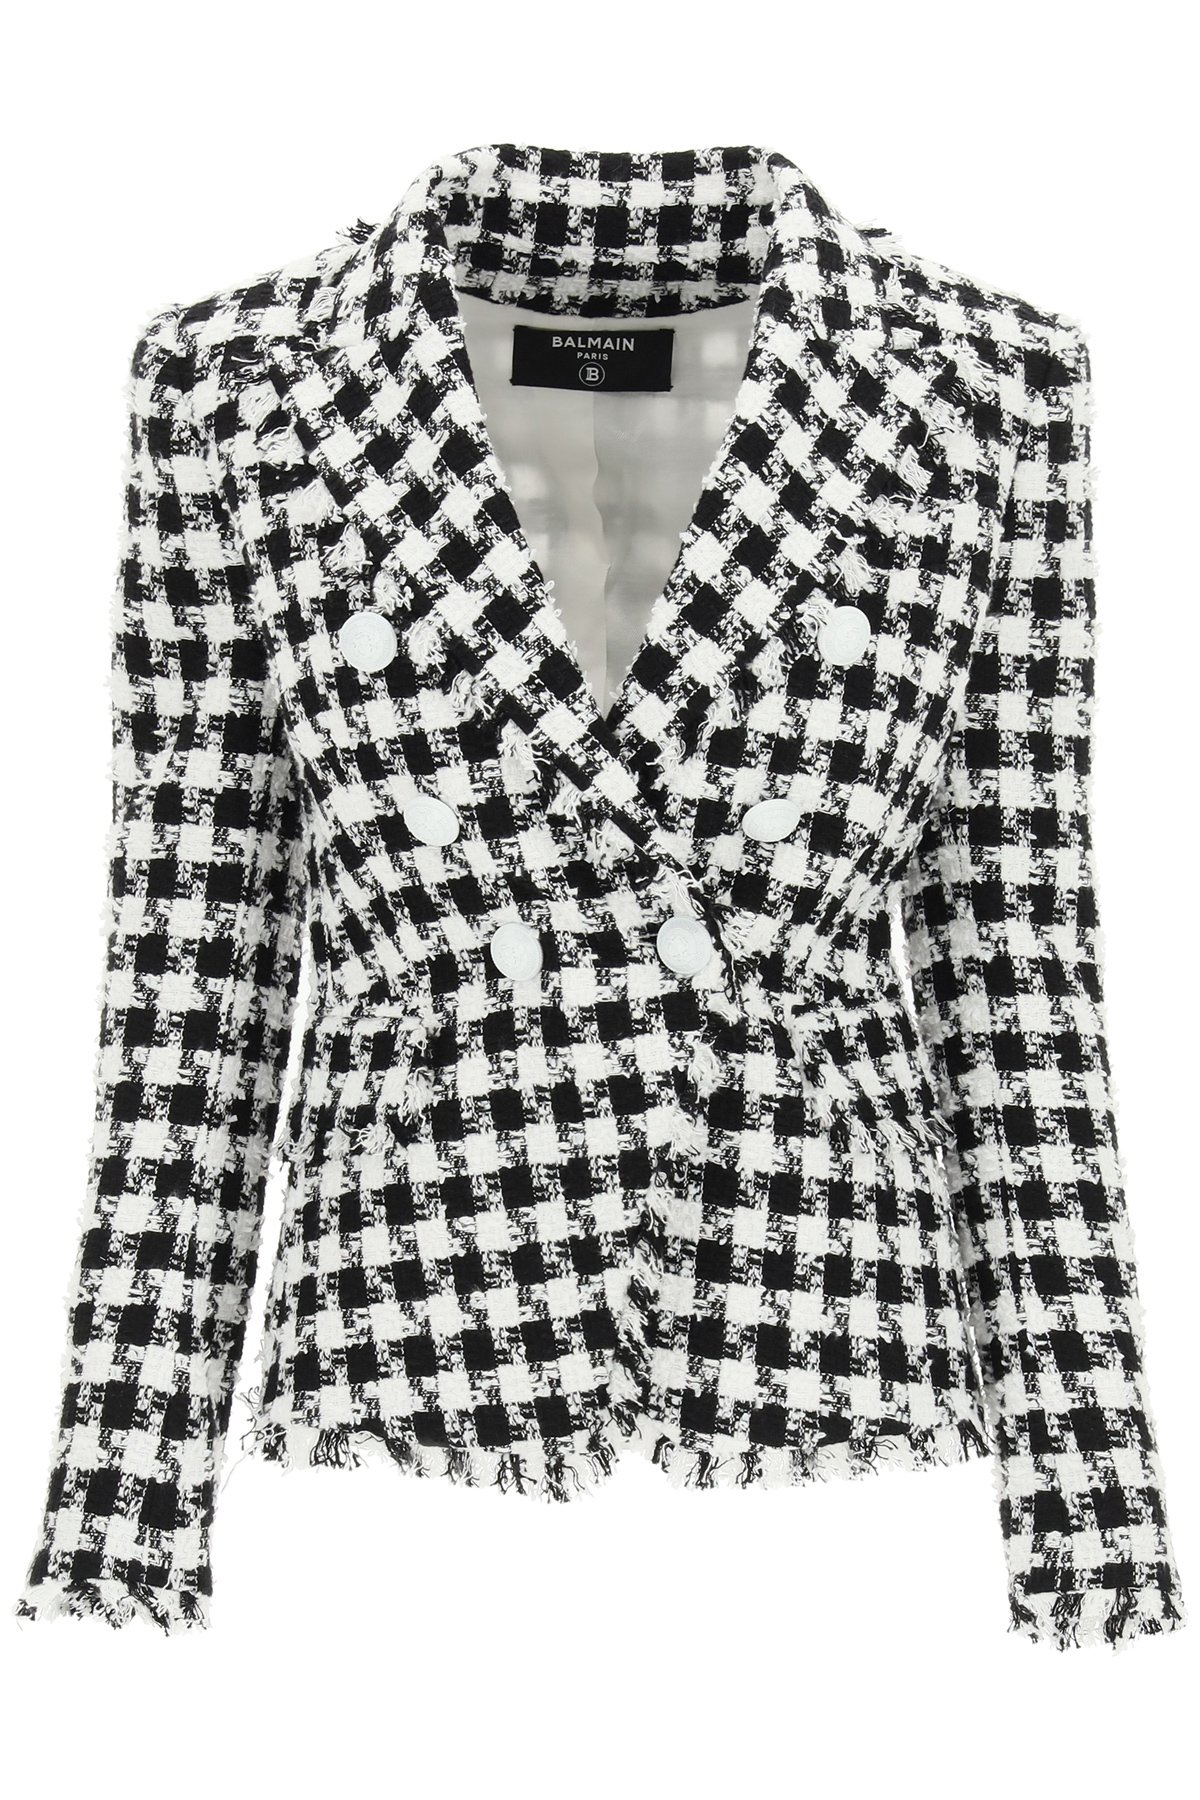 Balmain blazer in tweed